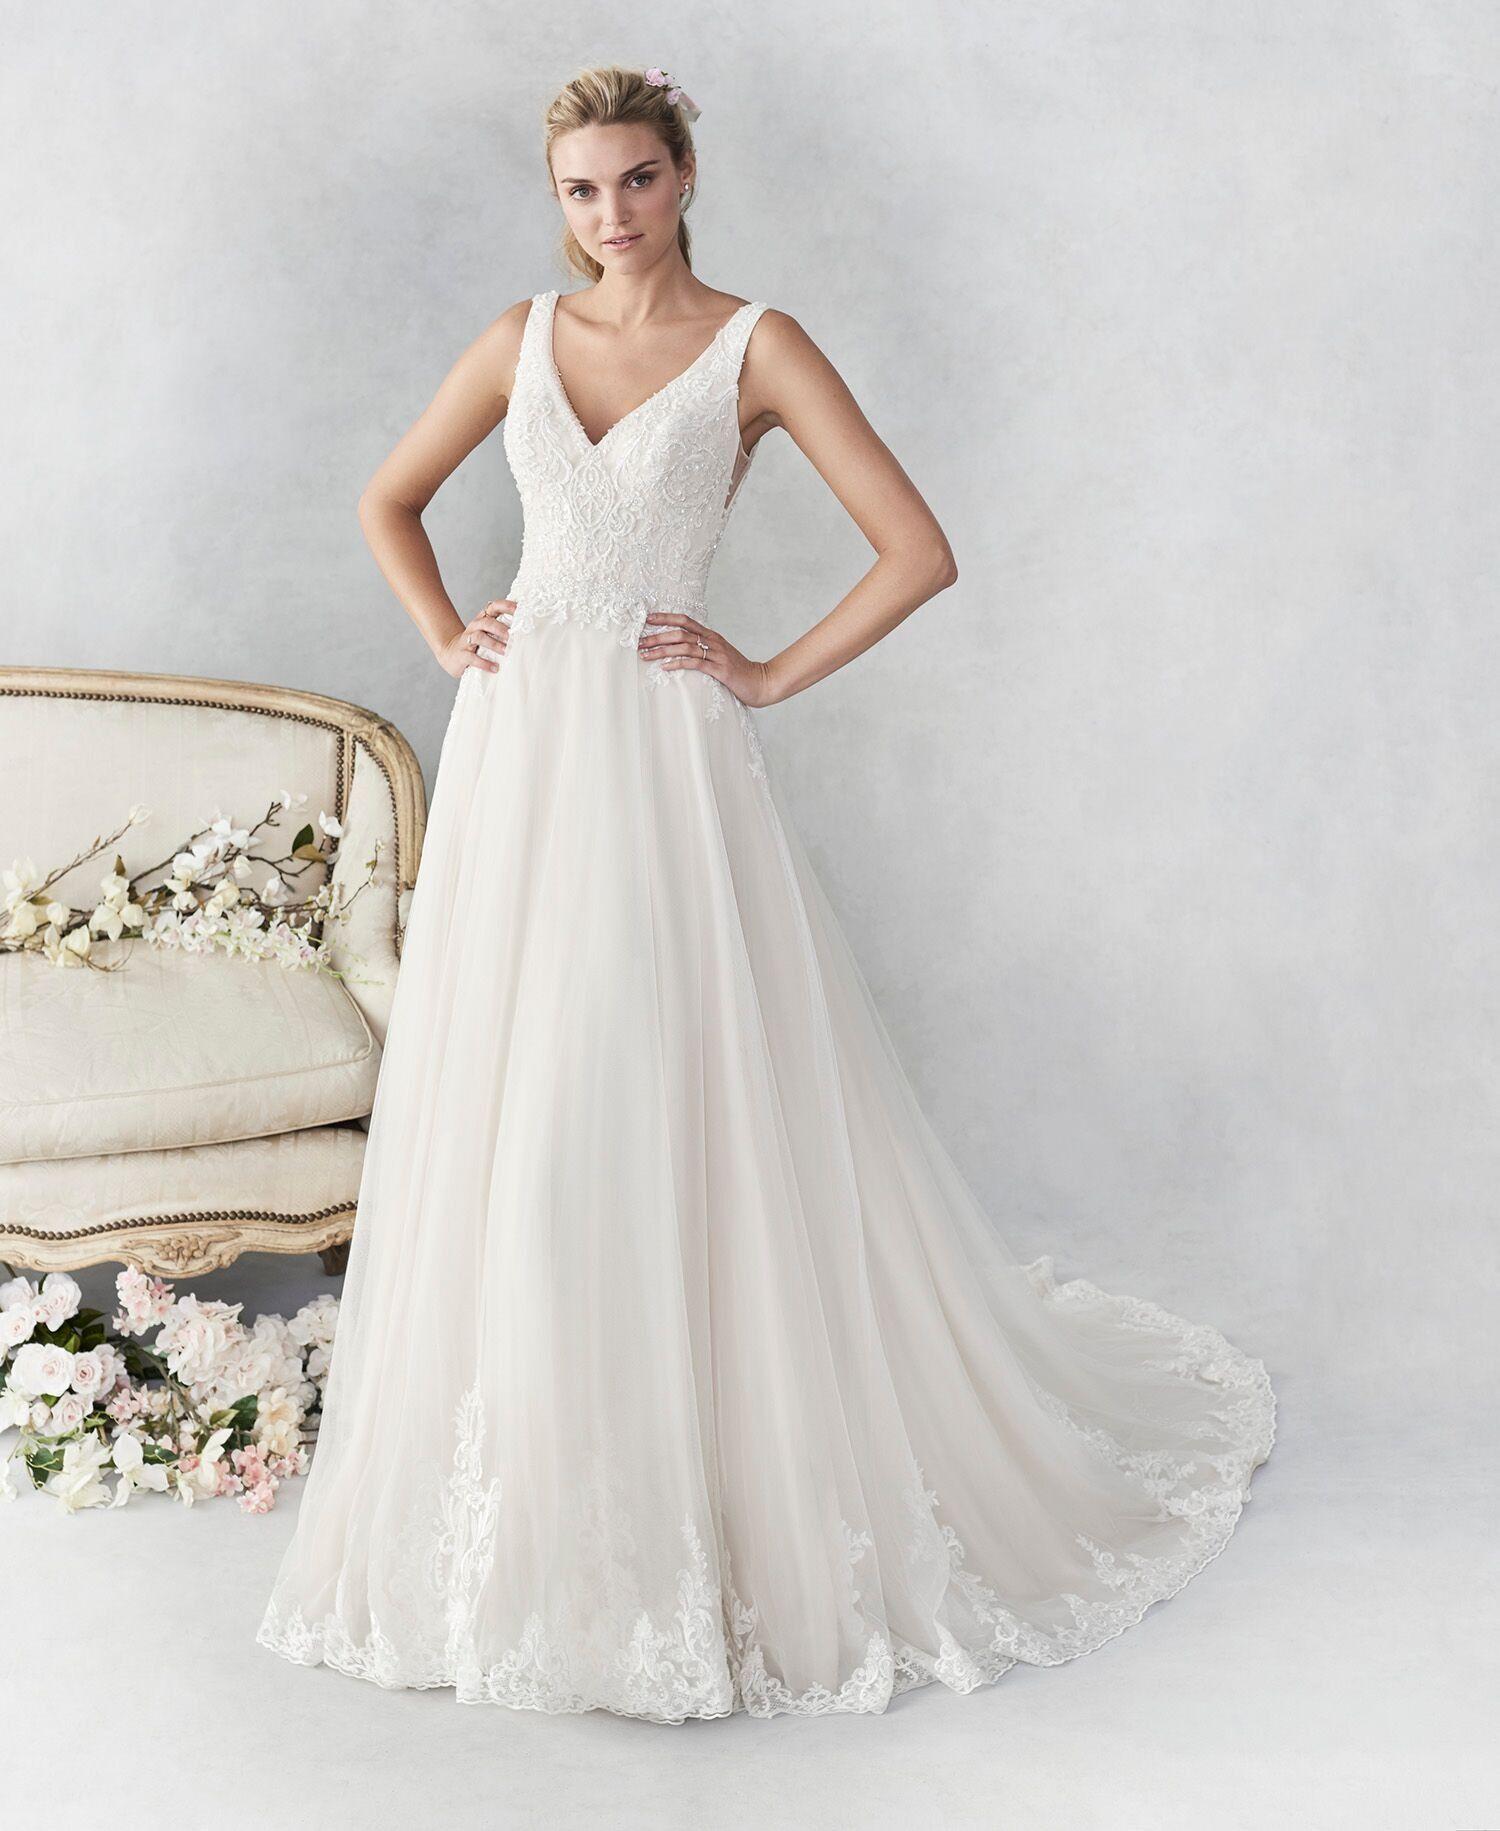 Romantic A Line Wedding Dress A Line Wedding Dress Simple Wedding Gowns Big Wedding Dresses